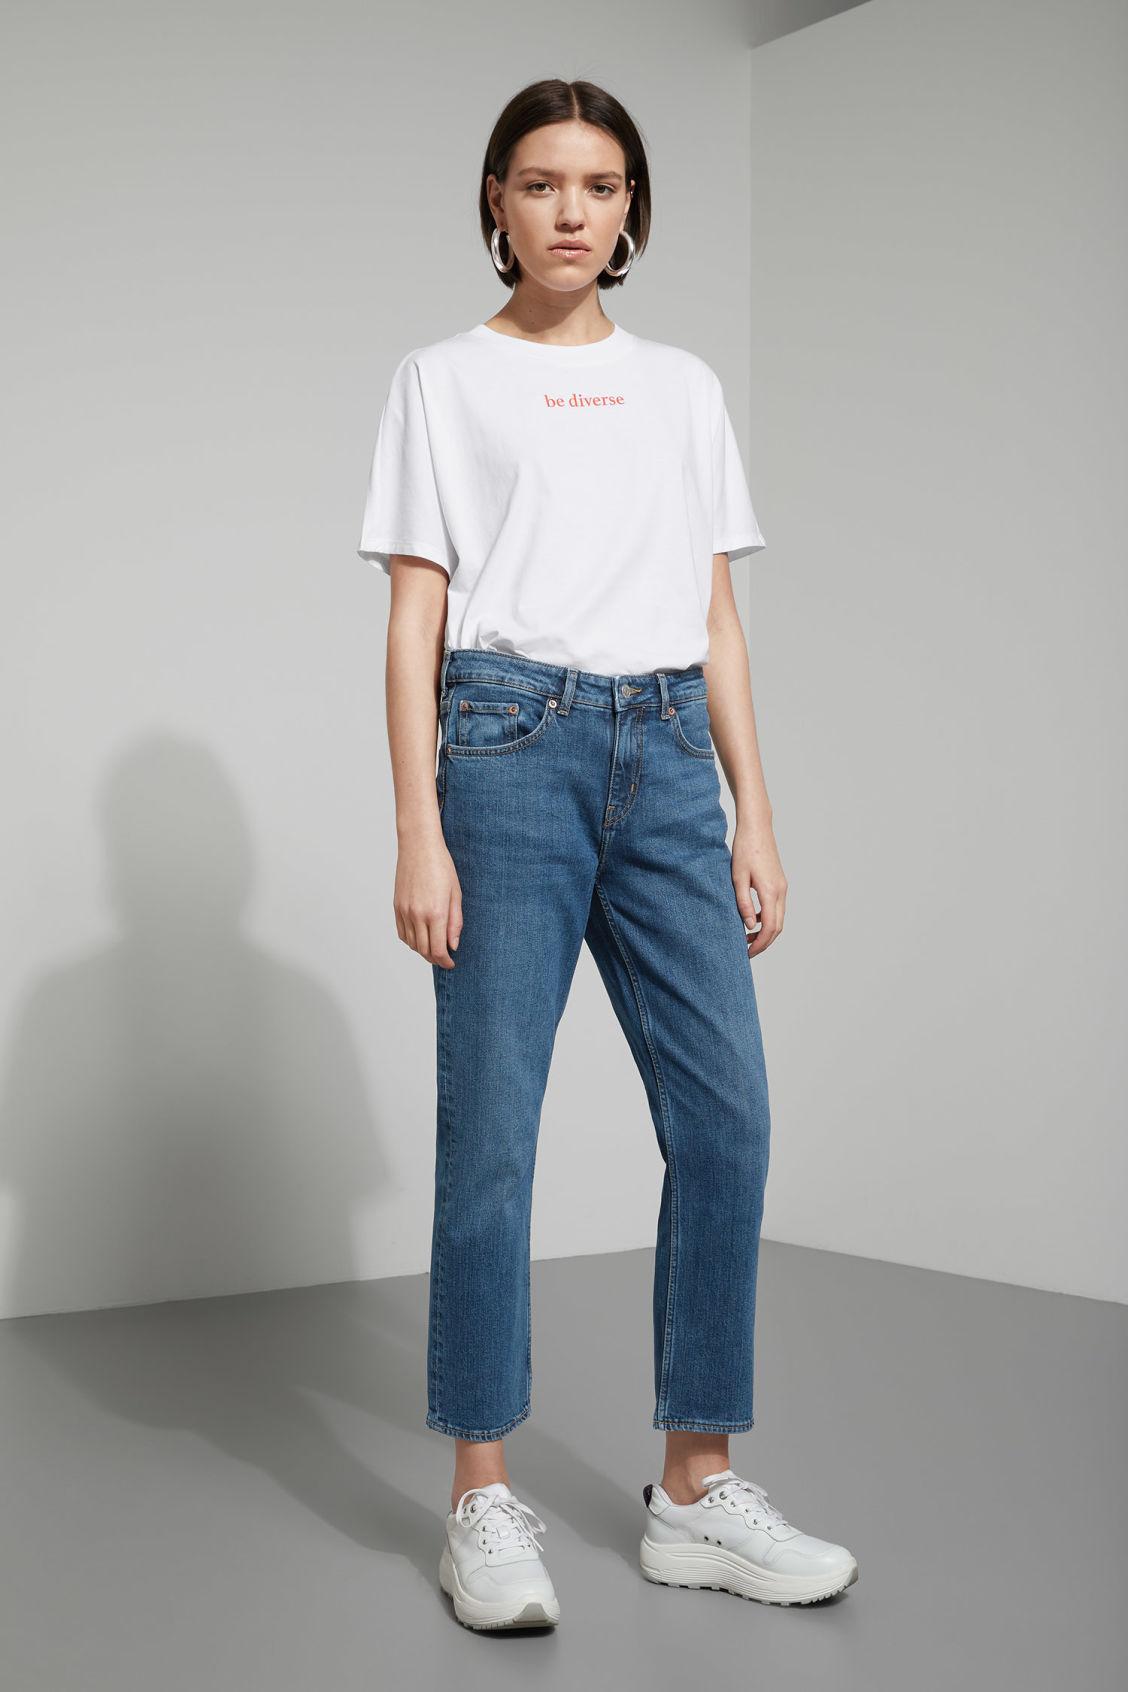 Weekday Ami Arizona Blue Jeans - Blue Vente Pas Cher En France CU1fRWogs